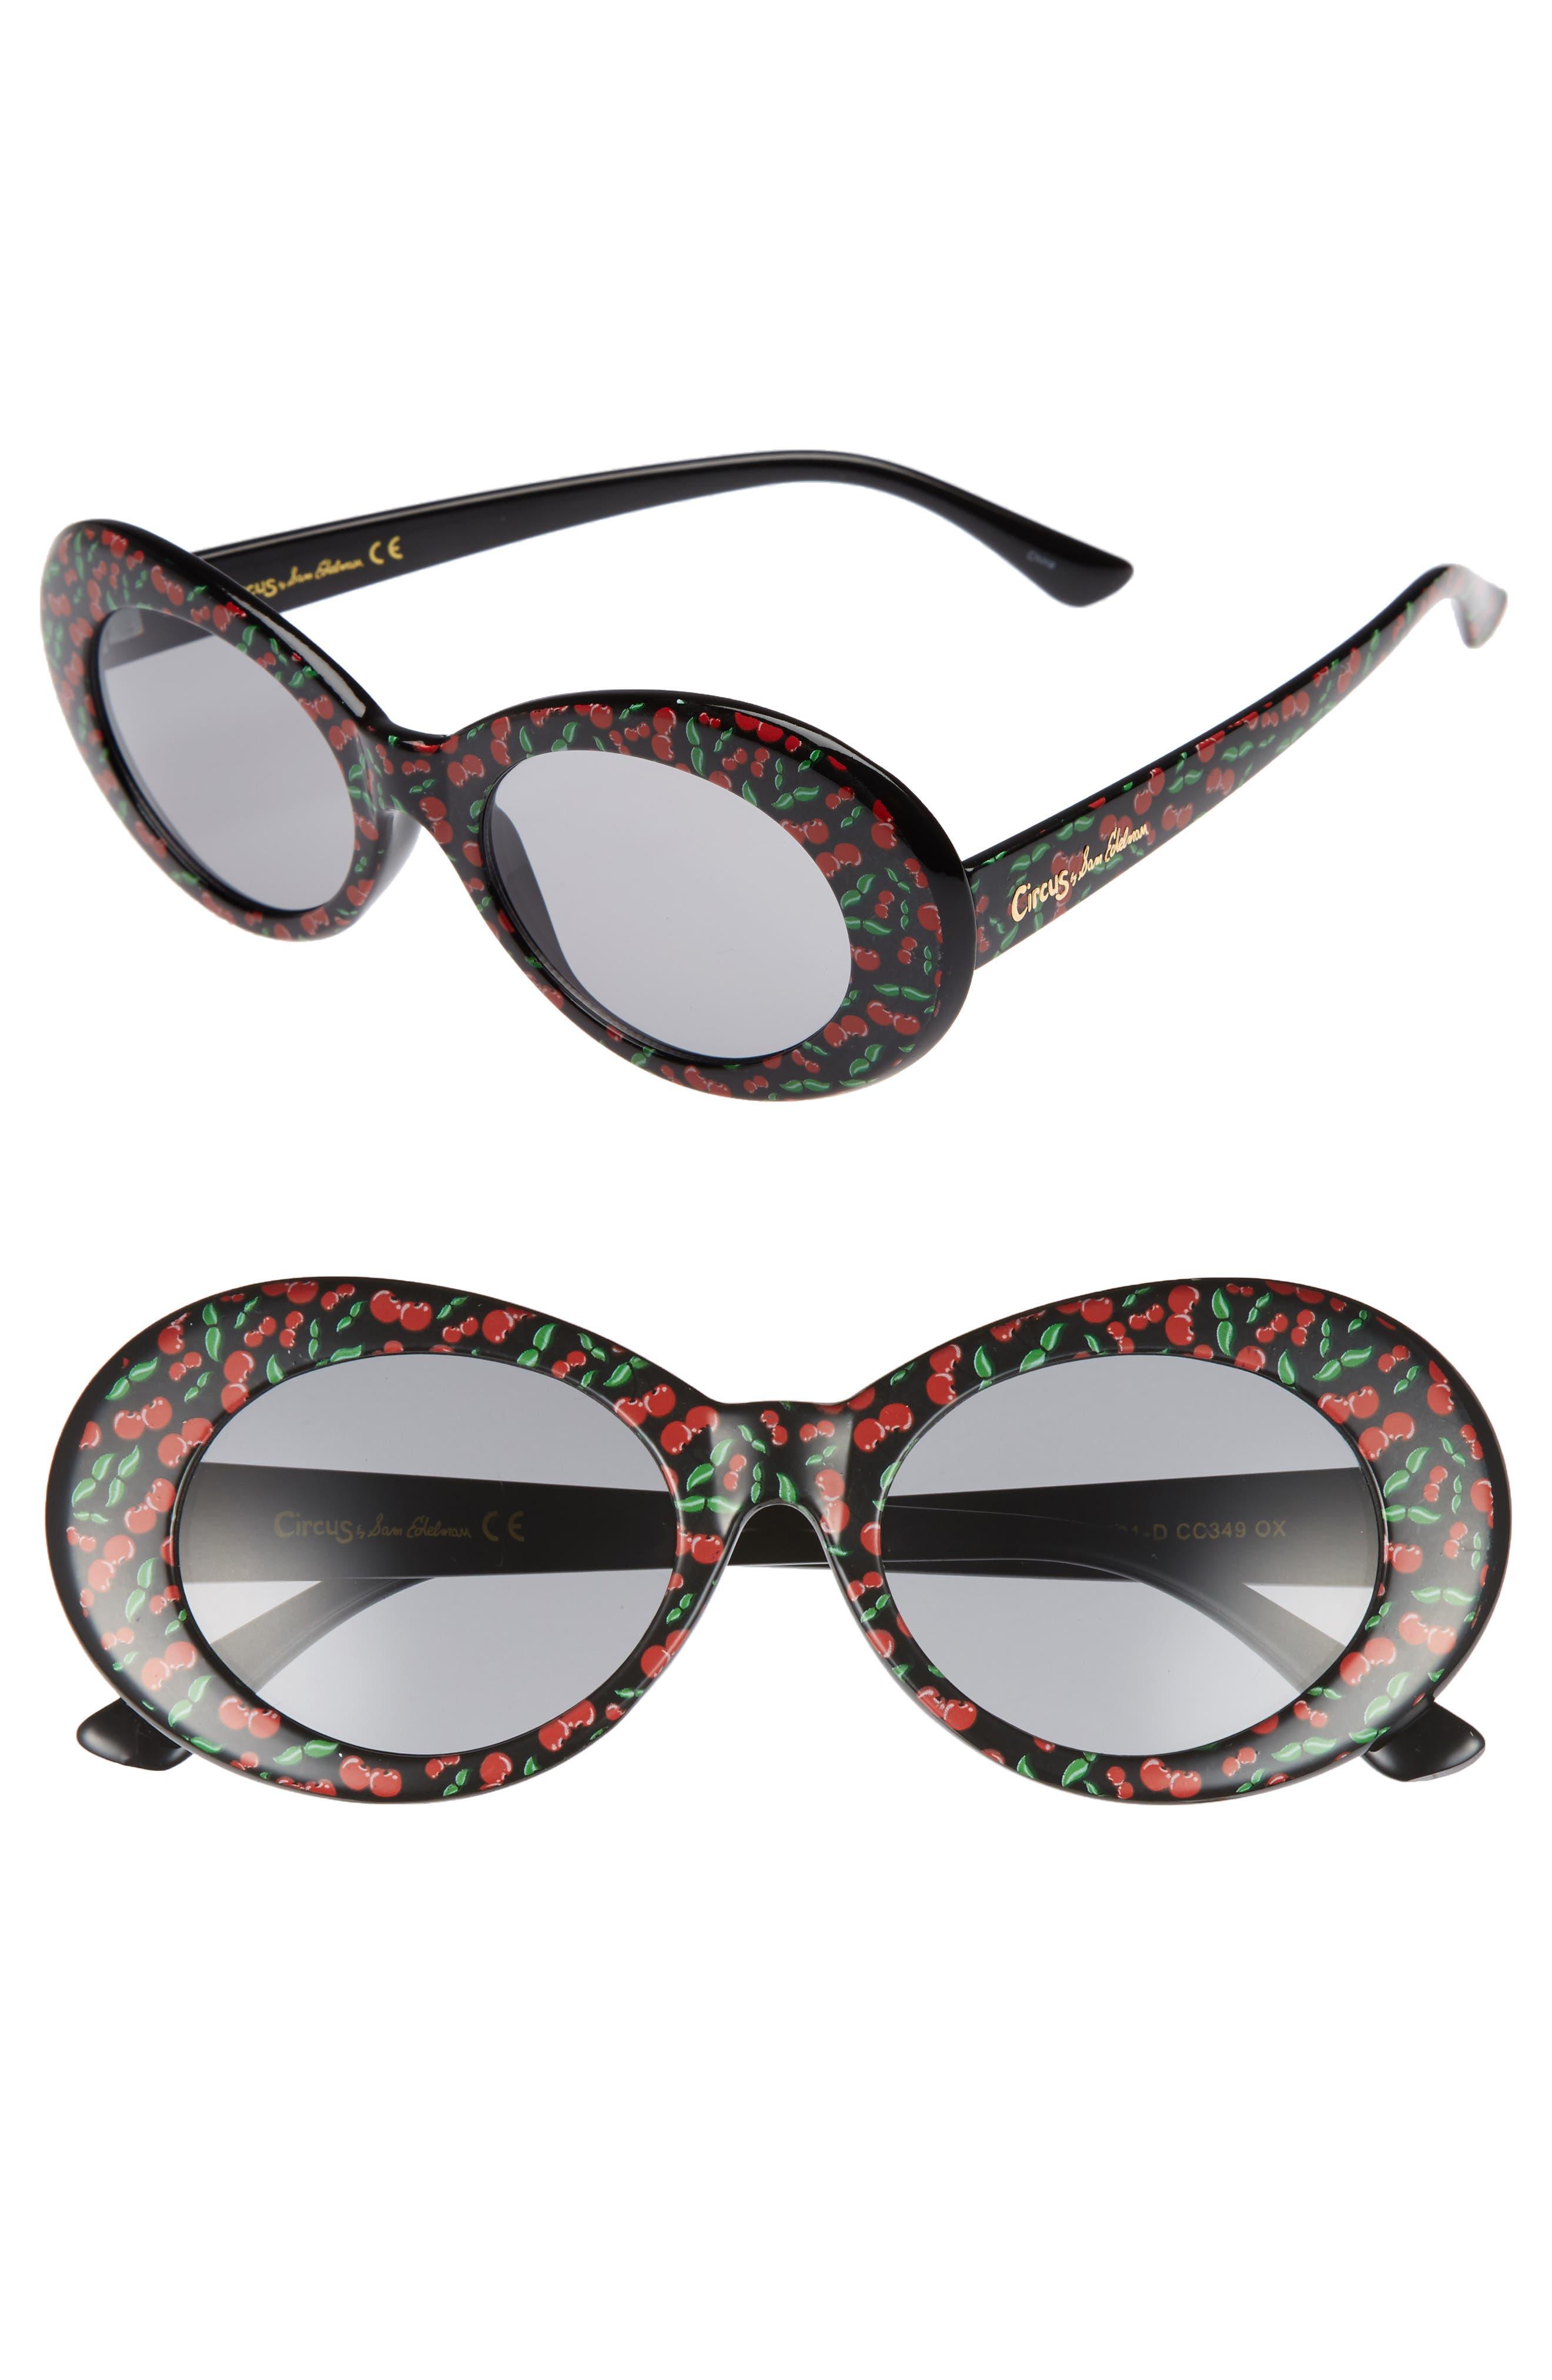 50mm Cherry Print Oval Sunglasses,                         Main,                         color, 008